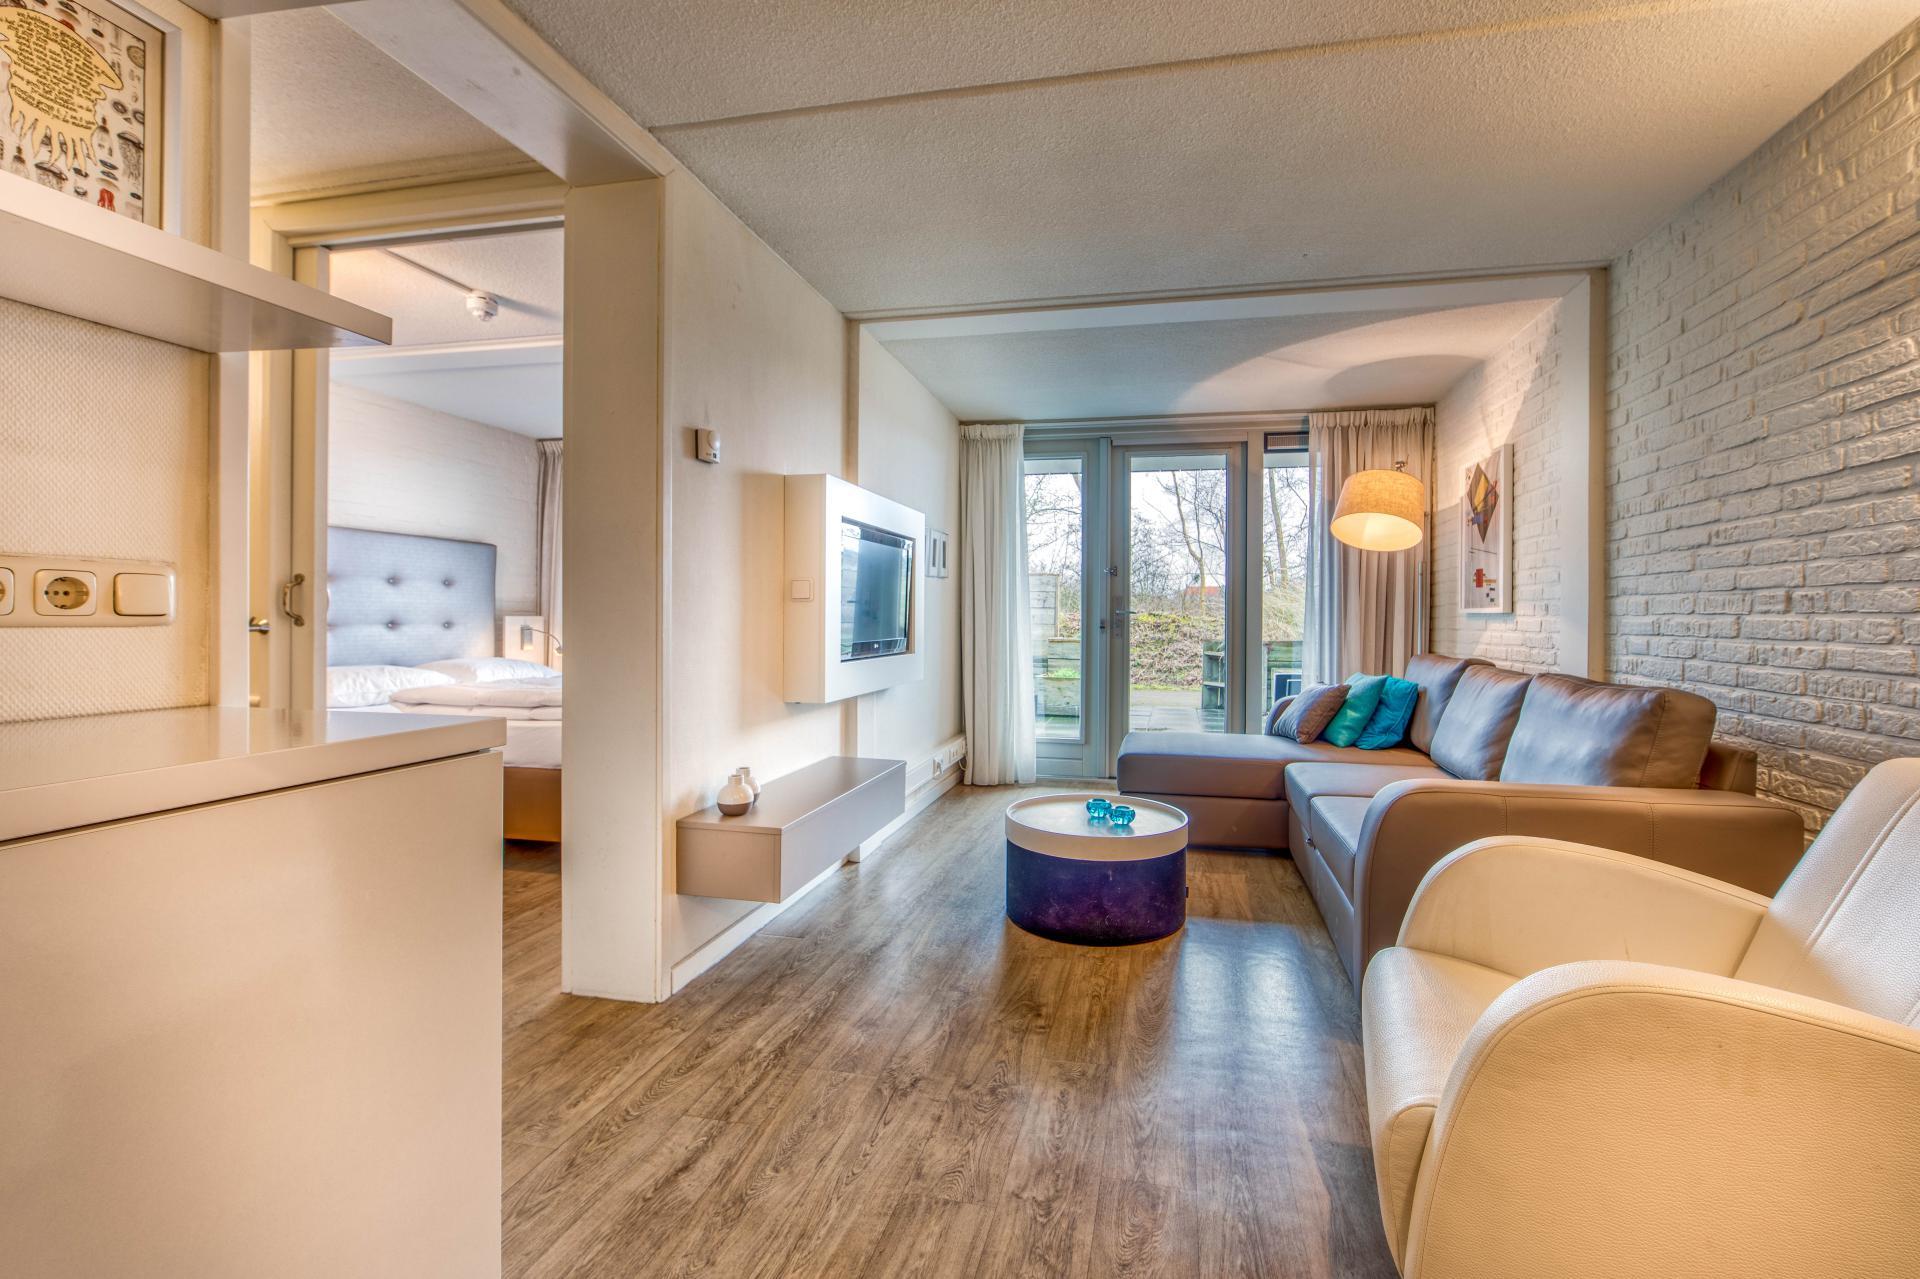 Strand Resort Schier Appartement 6 woonkamer en slaapkamer